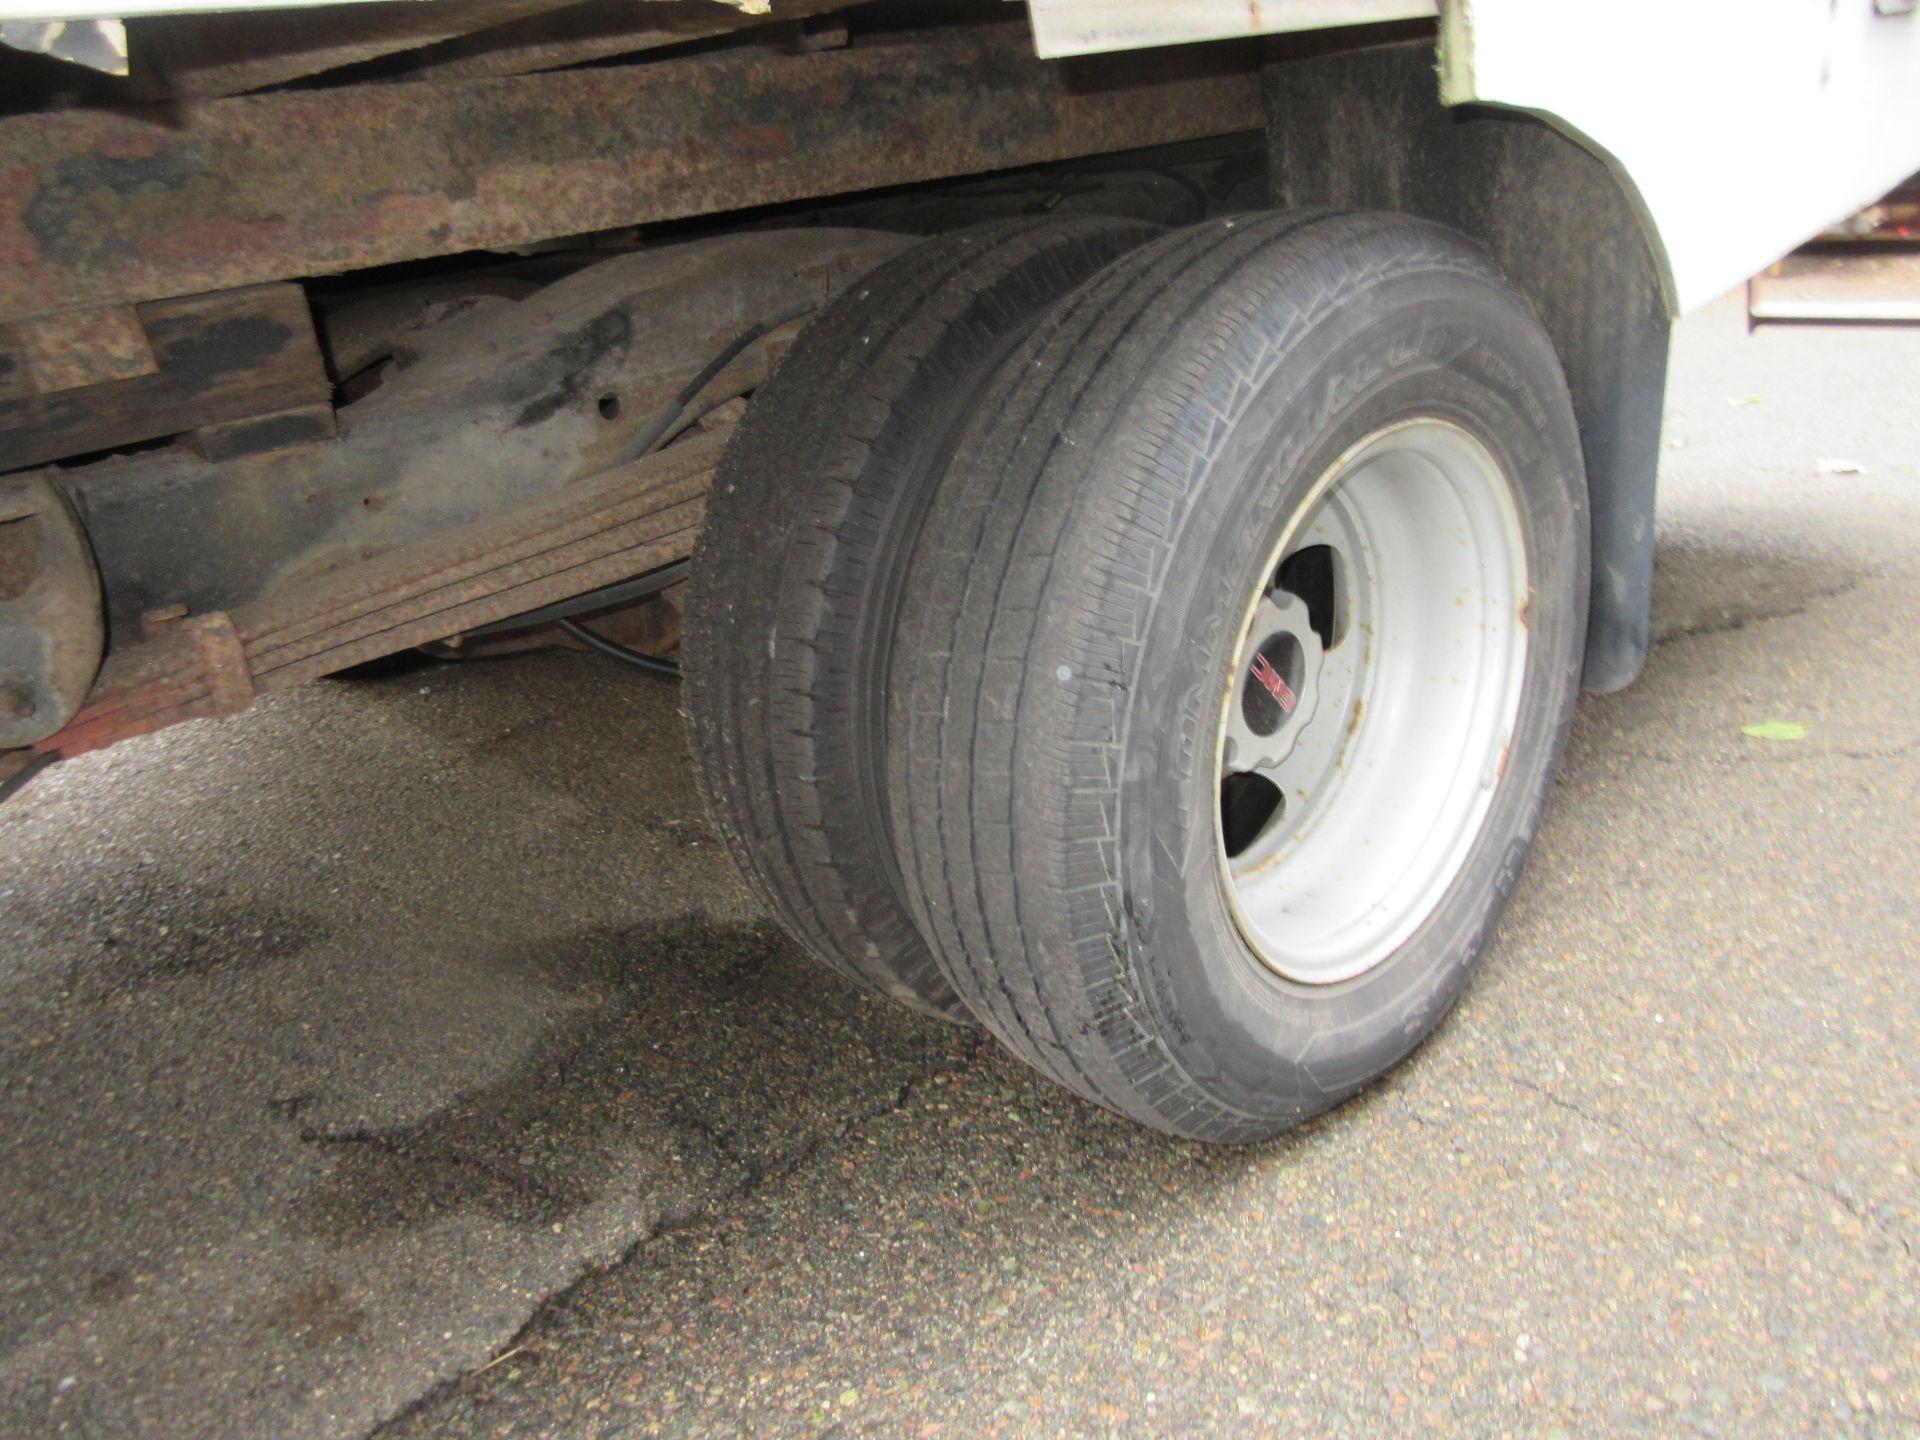 Bulk Bid Includes (1) Line Boring Truck Including 2004 GMC Savana 3500 Box Truck 2WD 8 Cylinders U - Image 7 of 27